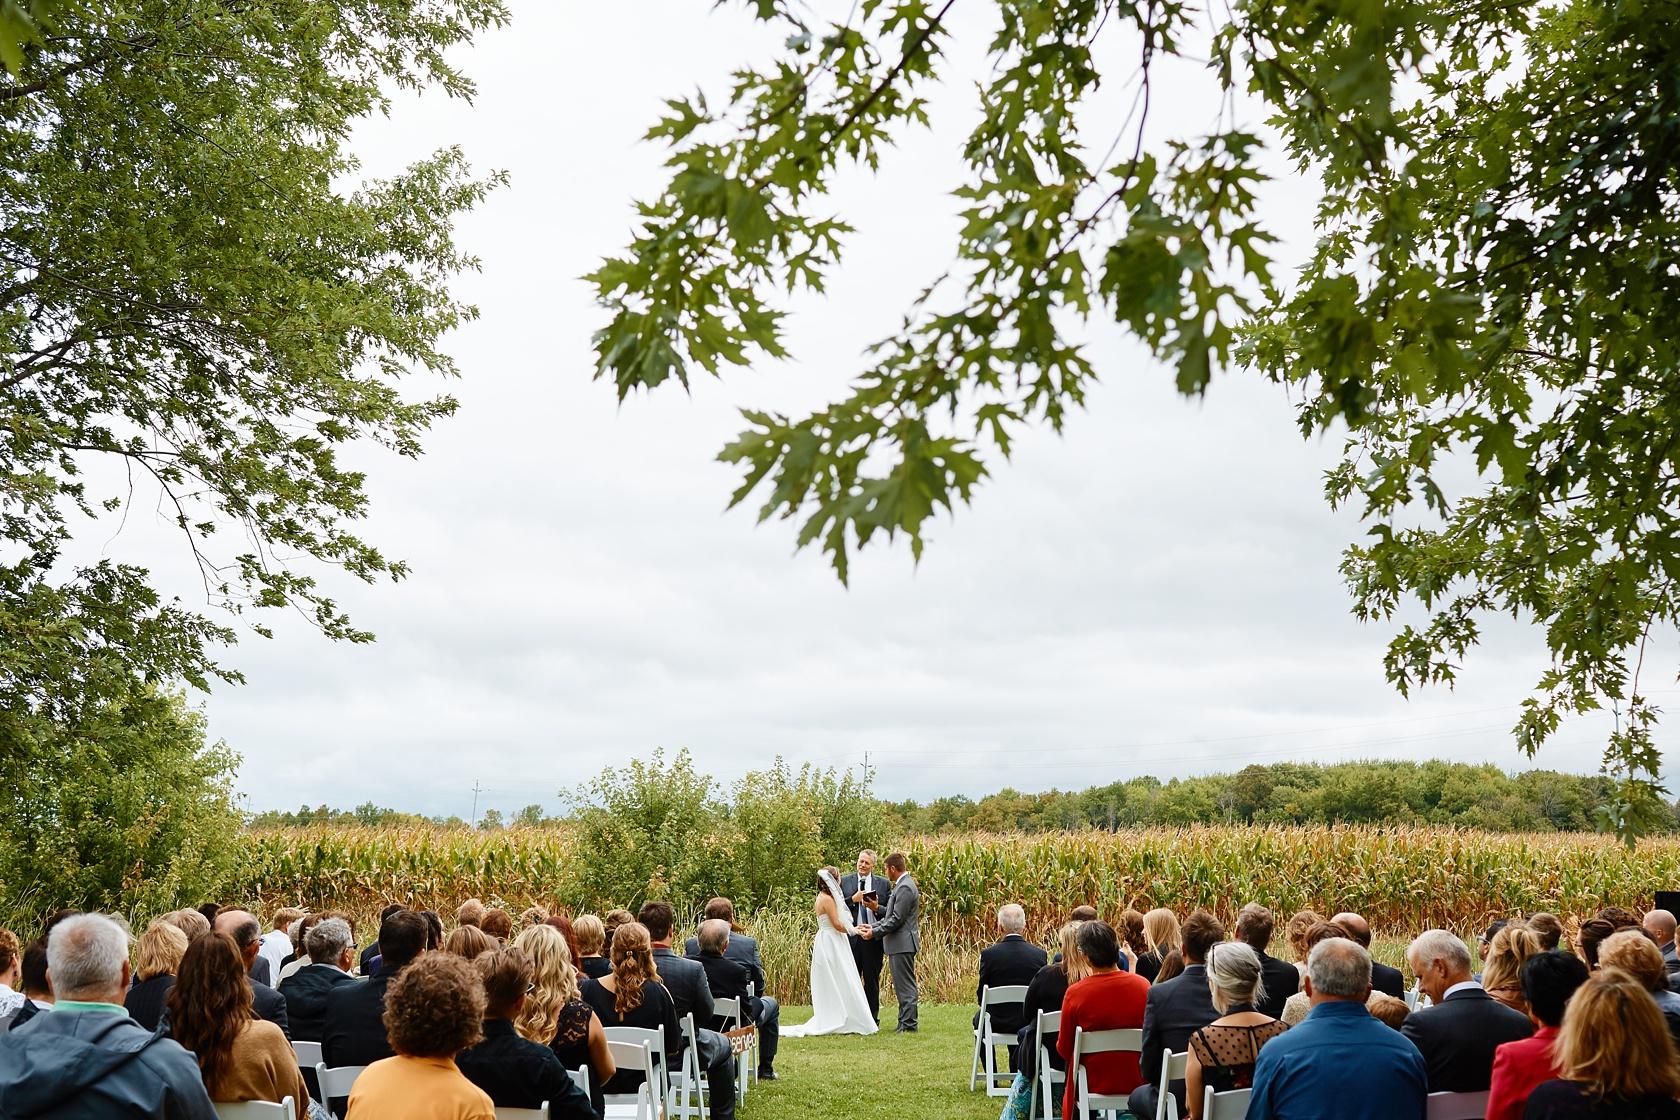 000015-farm-wedding-stephen-sager-photography